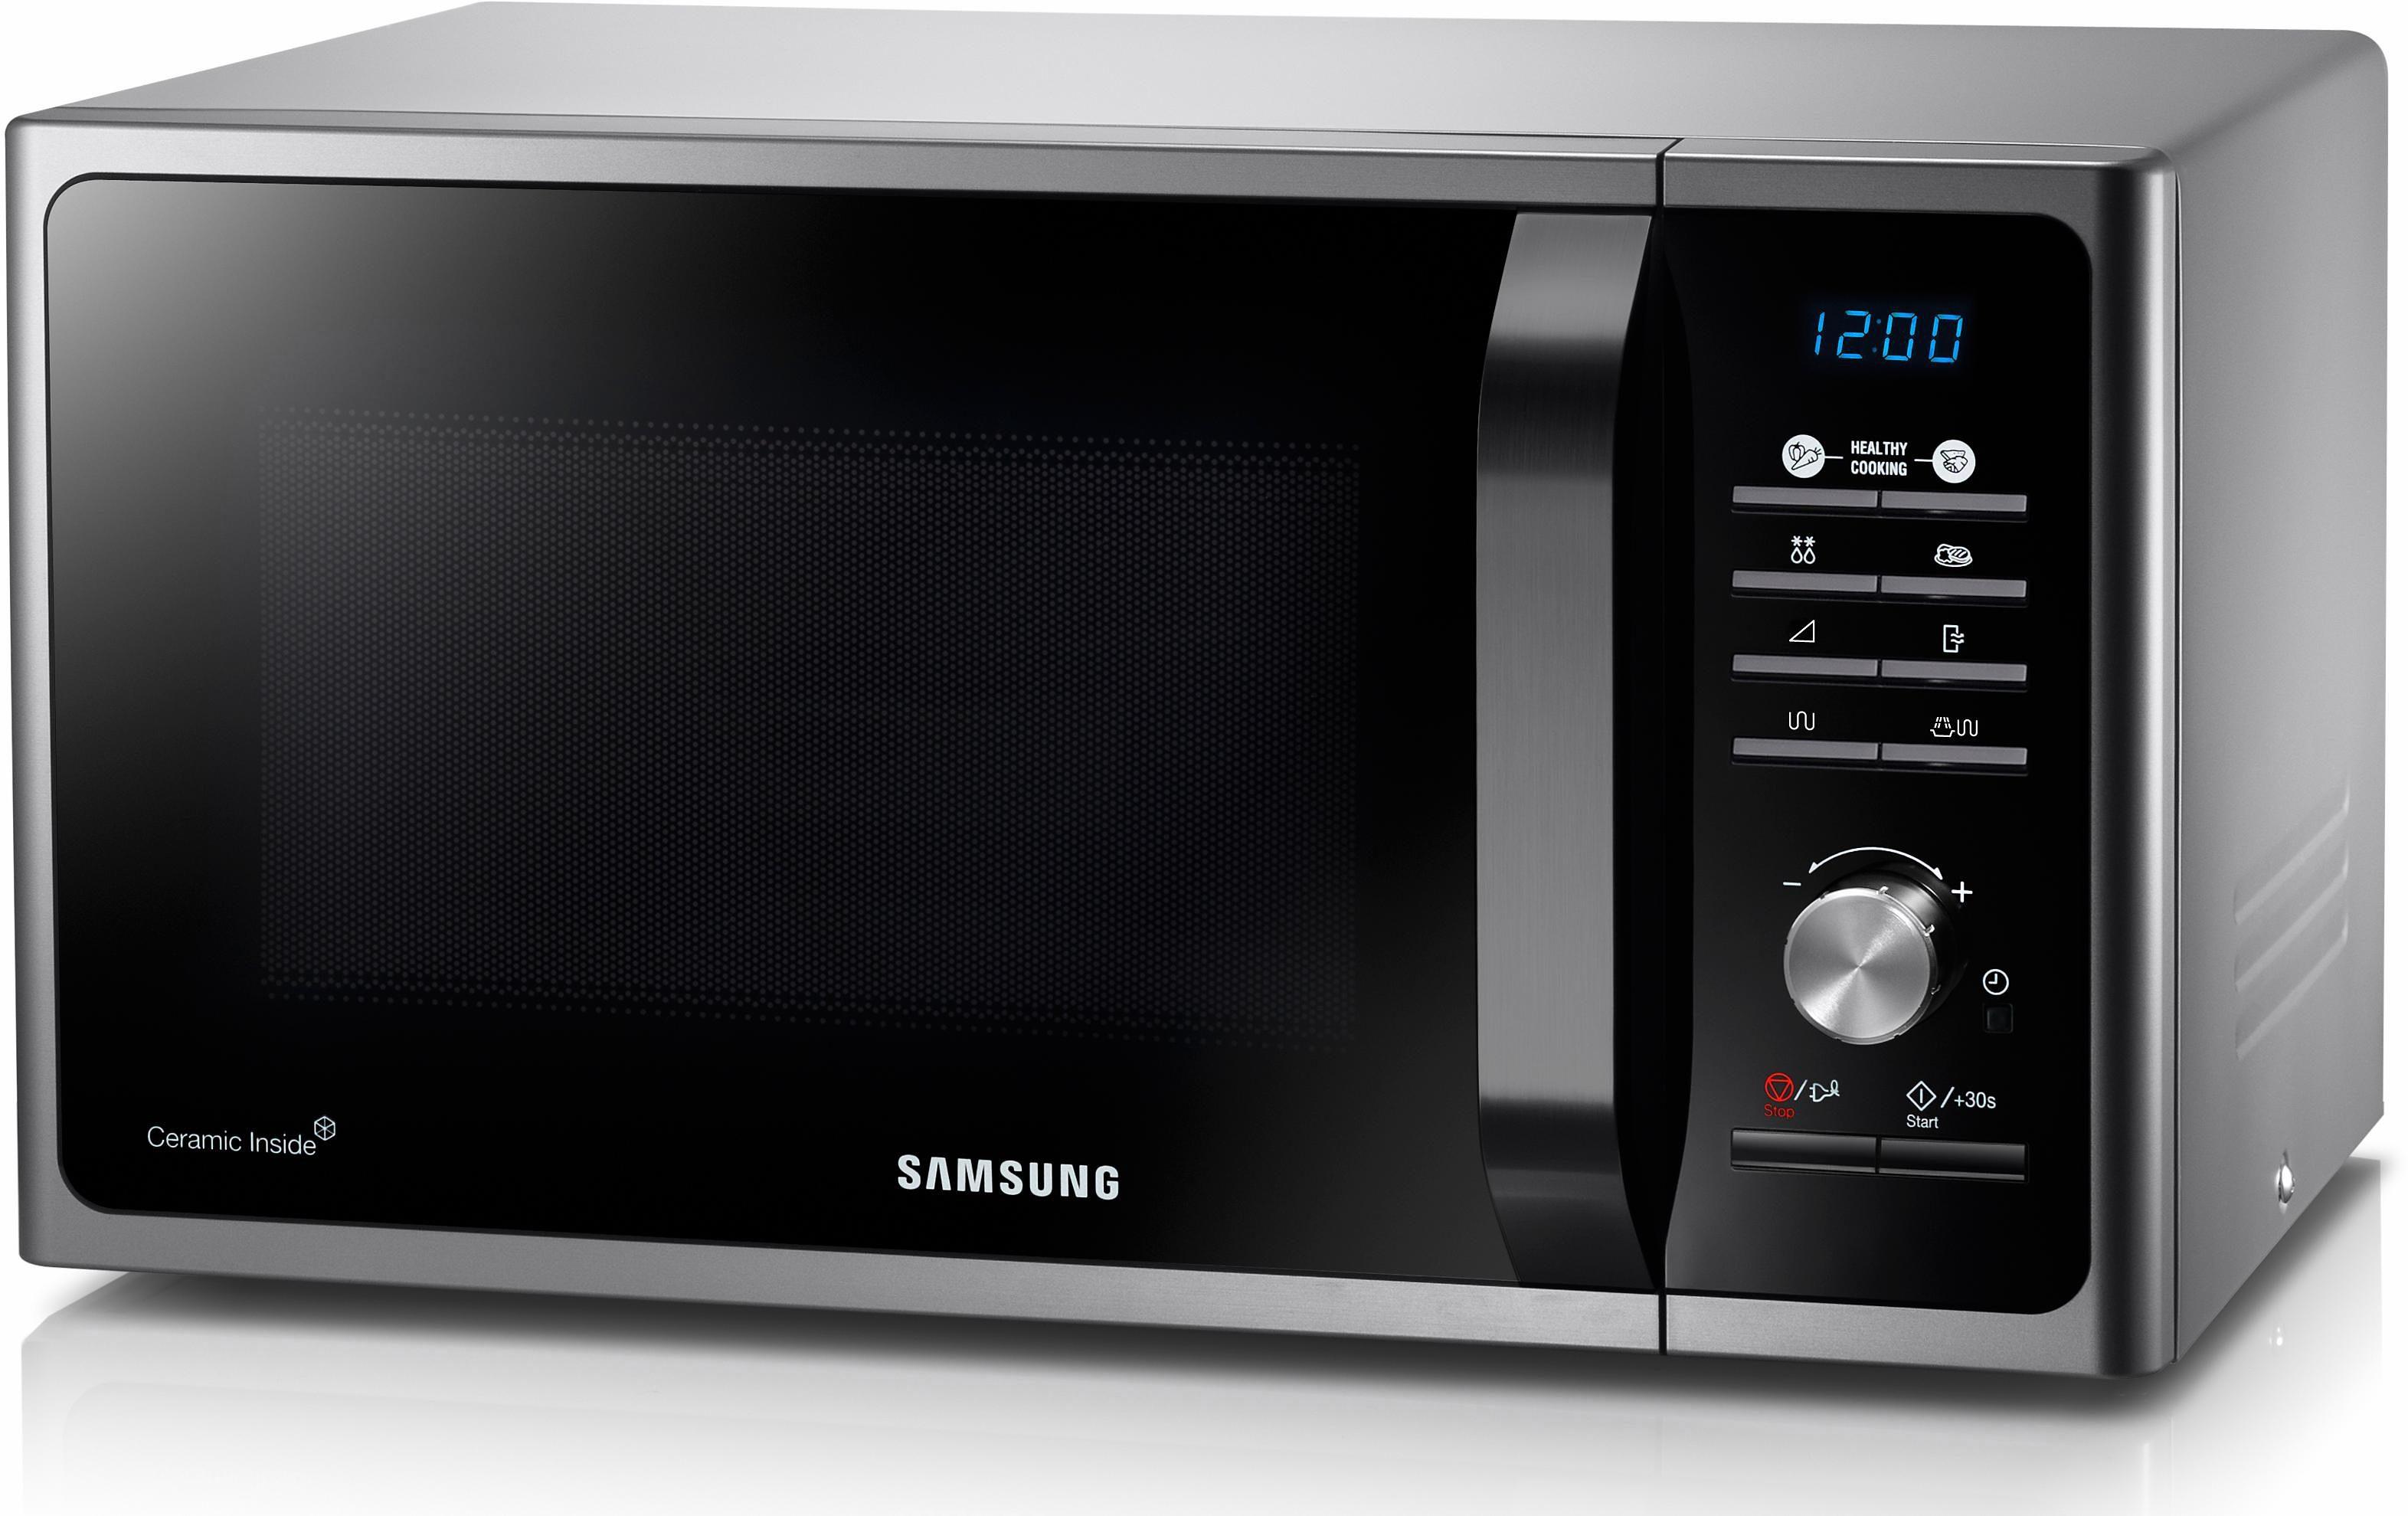 Samsung Mikrowelle MG23F301TAS/EG, mit Grill, 23 Liter Garraum, 800 Watt